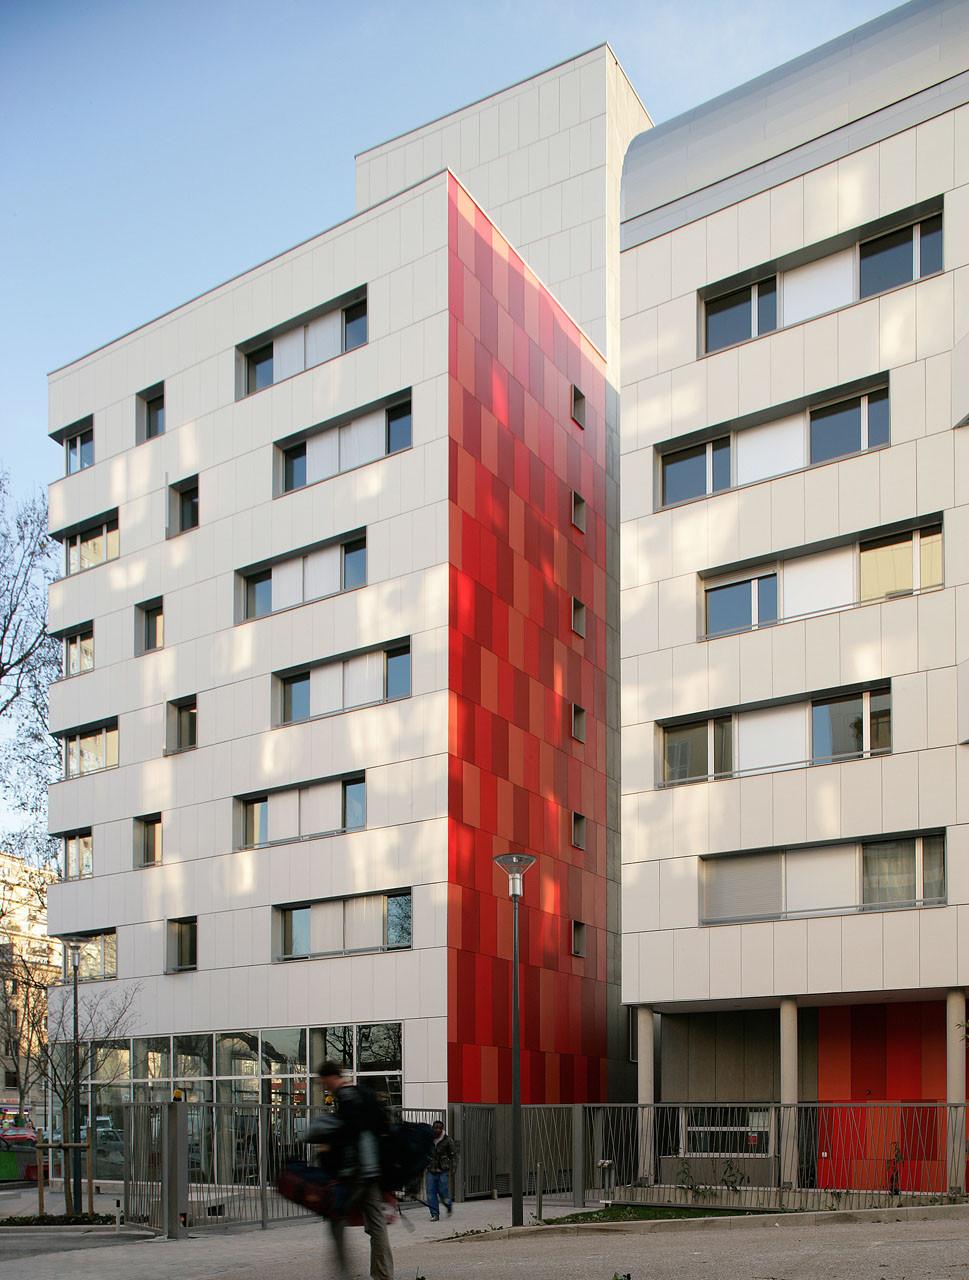 H&E Housing / David Elalouf Architecte, © Stephan Lucas